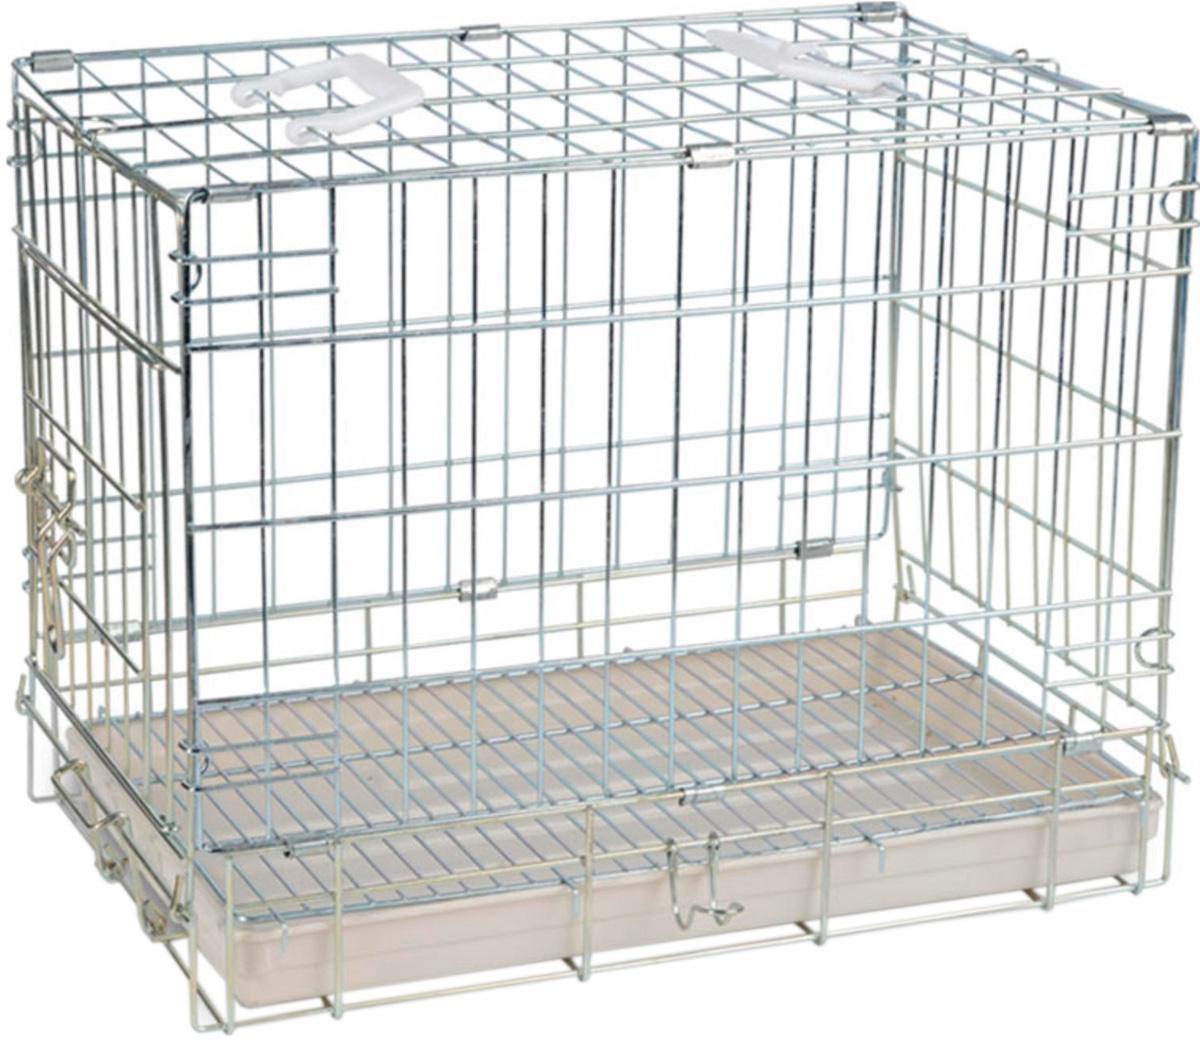 Клетка для животных Triol 001z цинк 51 х 33 х 40 см (1 шт) переноска для животных triol premium large 80 1 х 56 2 х 59 см 1 шт